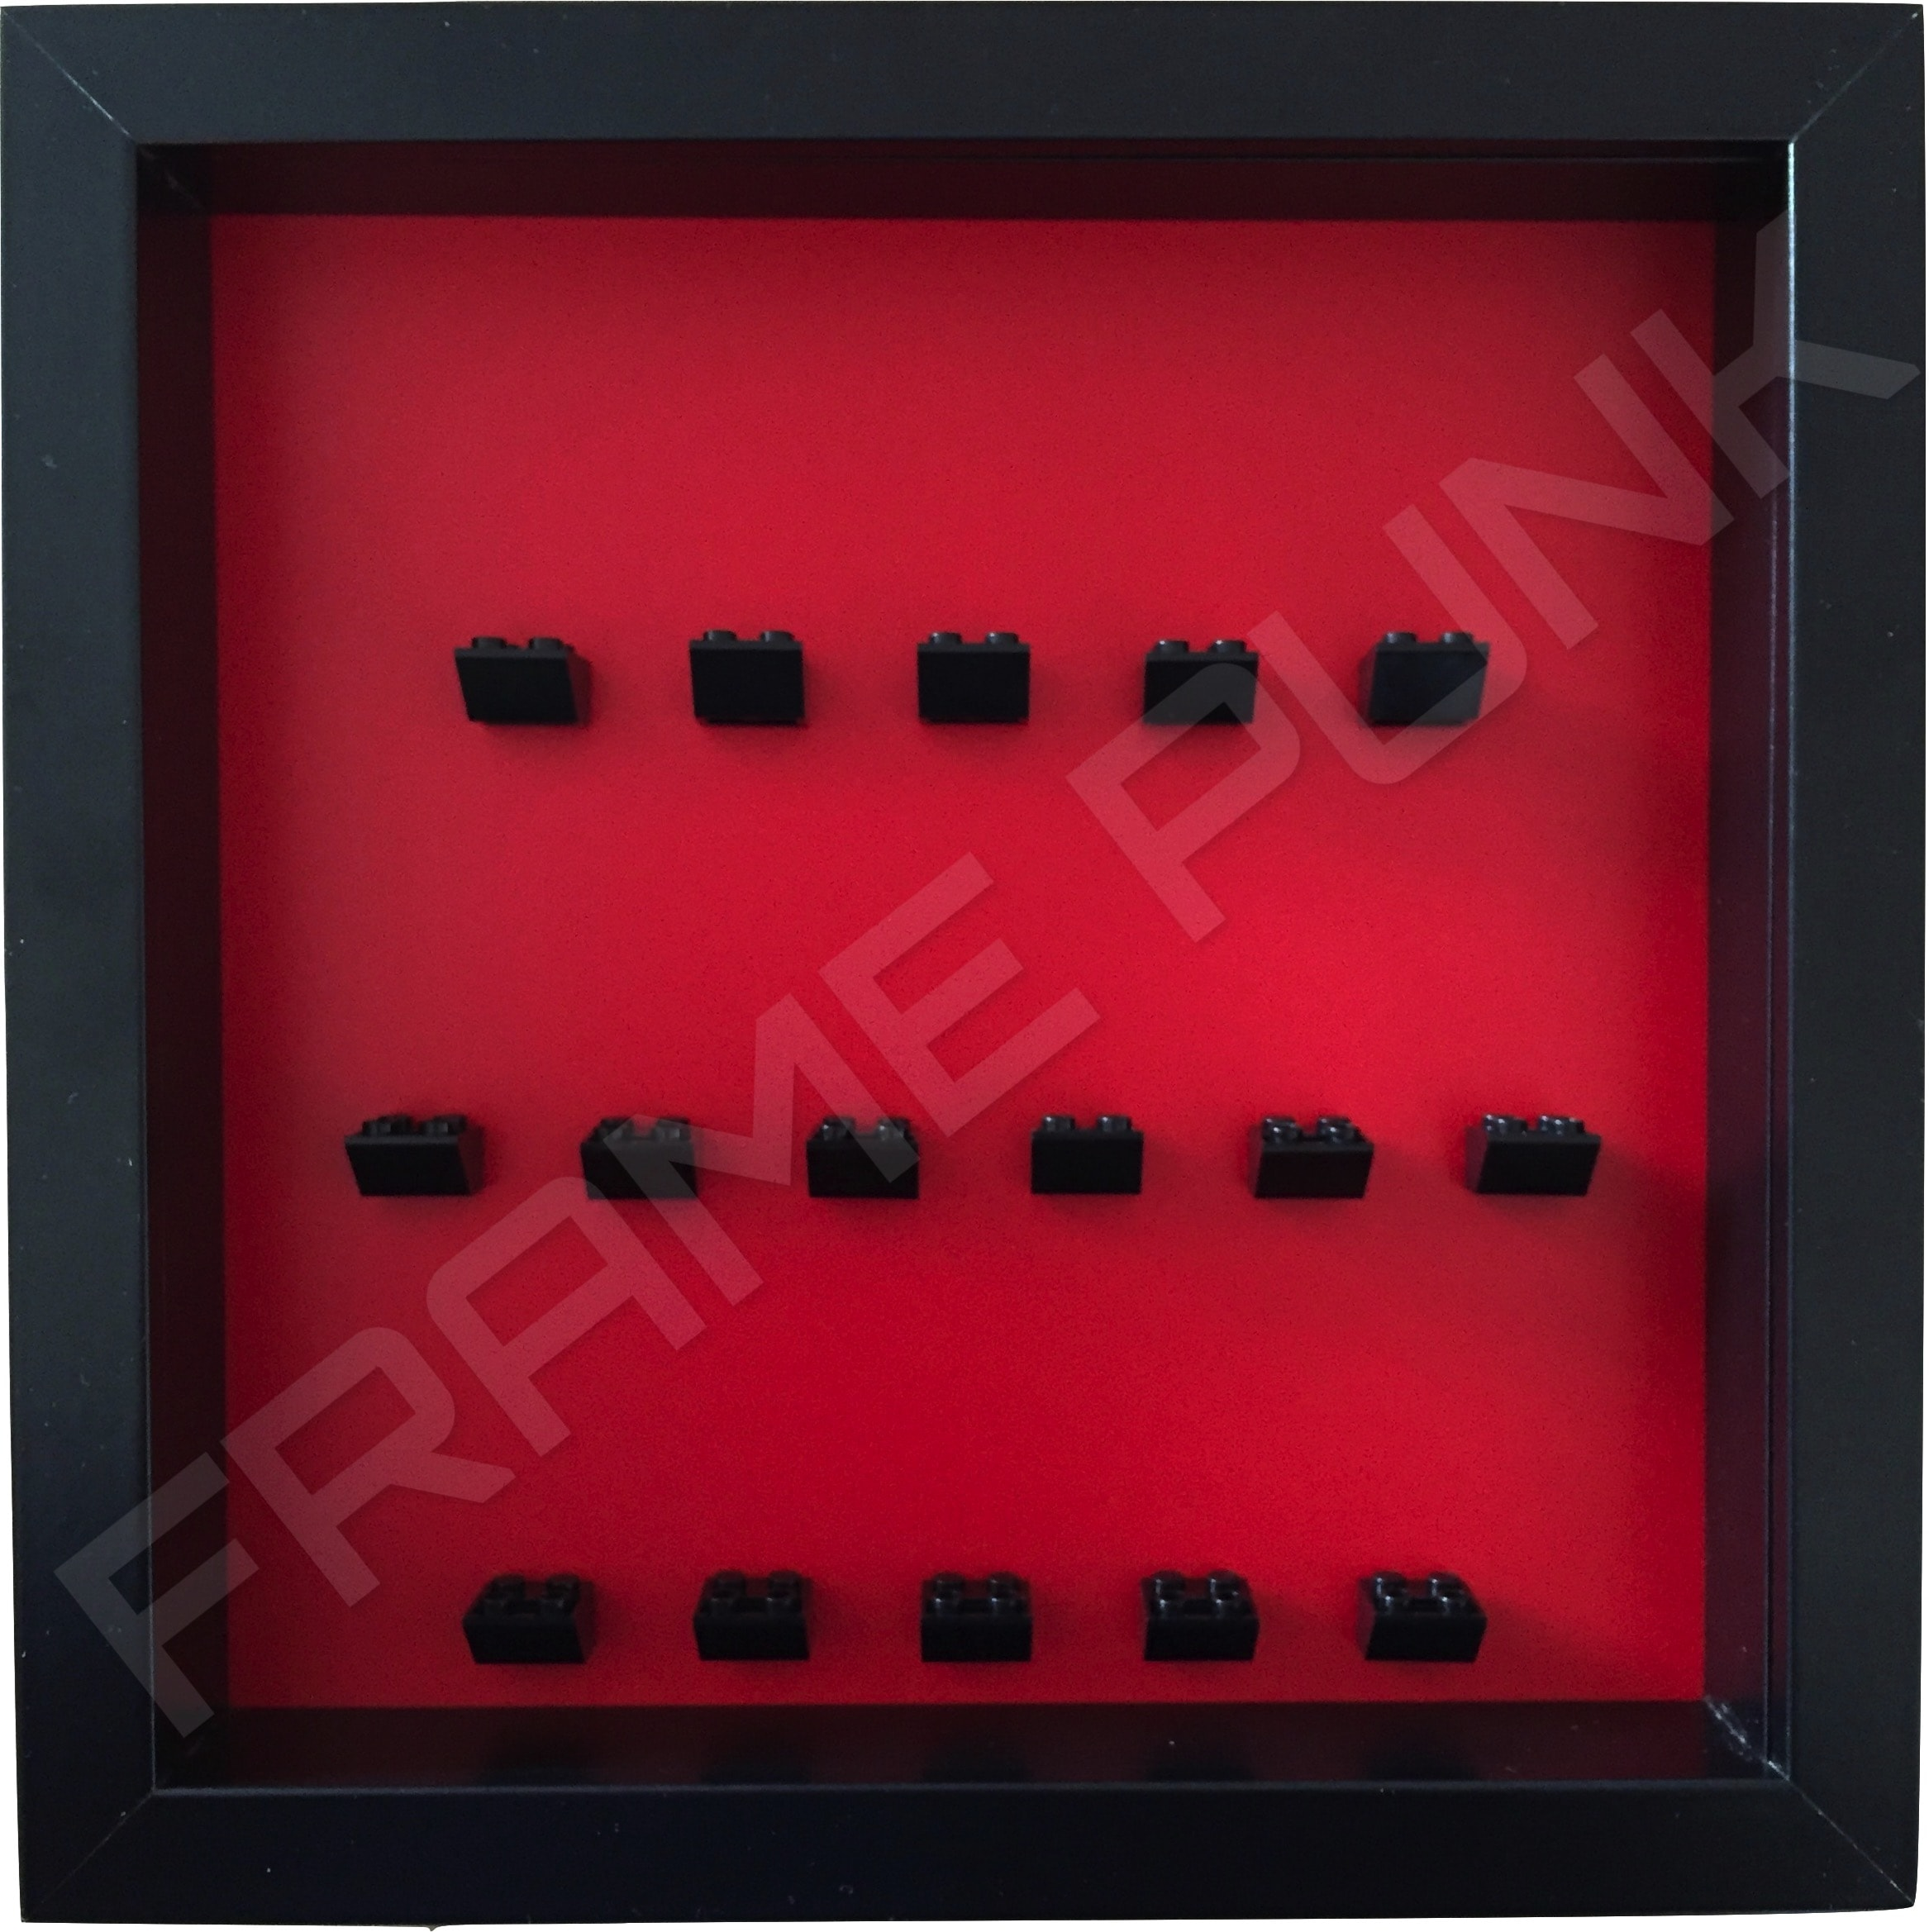 Black Lego brick formation on red background